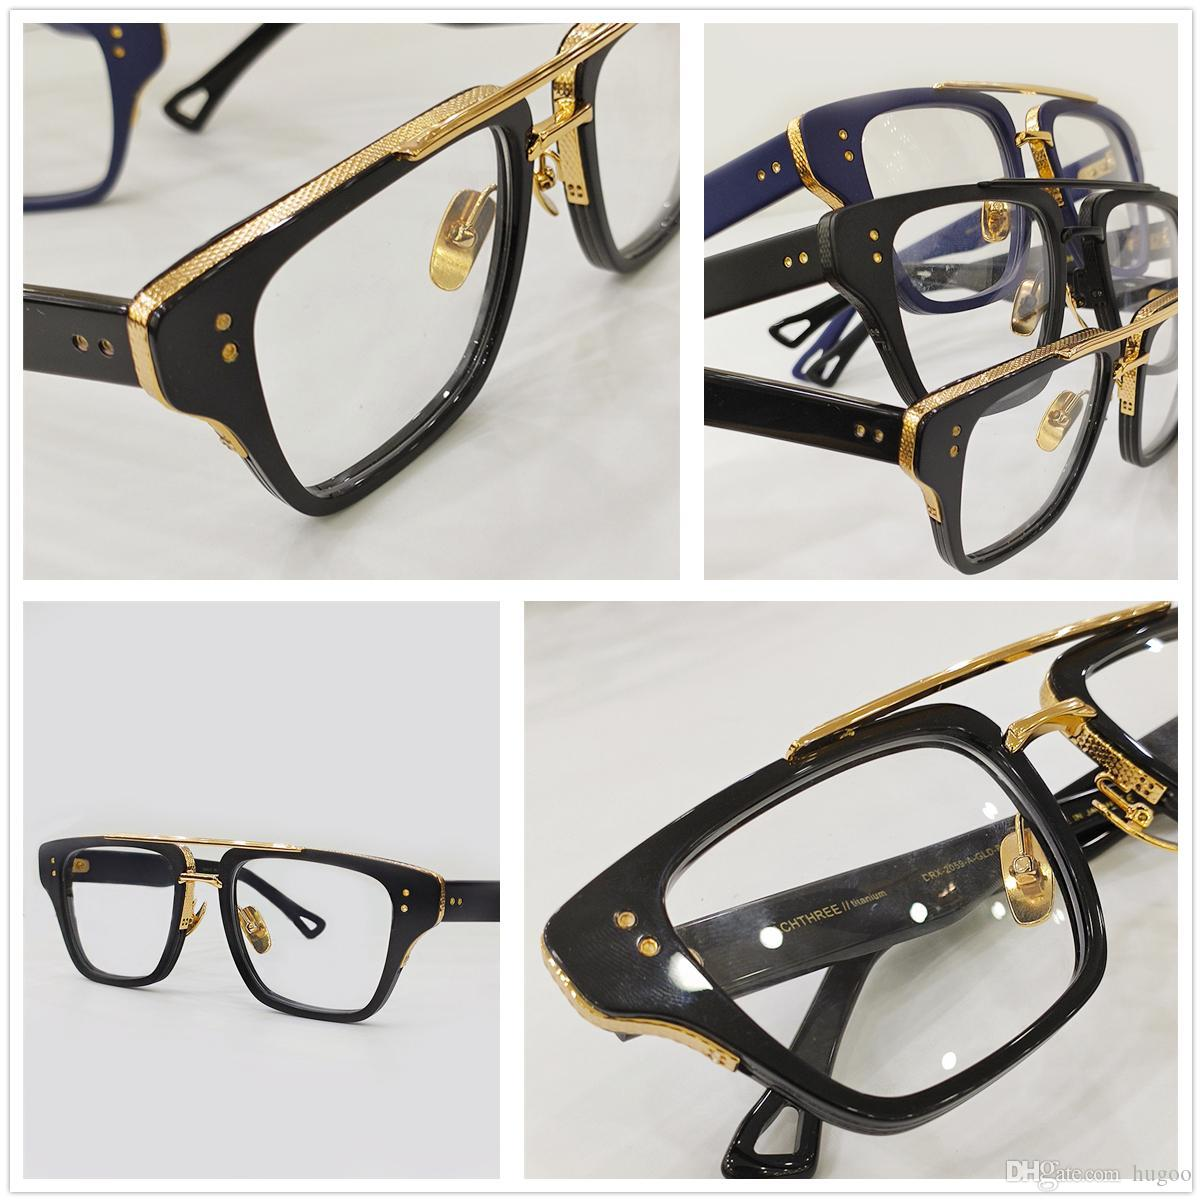 Mens Fashion Eye Transparent Glasses Clear Glass Eyeglasses Myopia Presbyopia Prescription Optical Spectacle Frames MACH 3